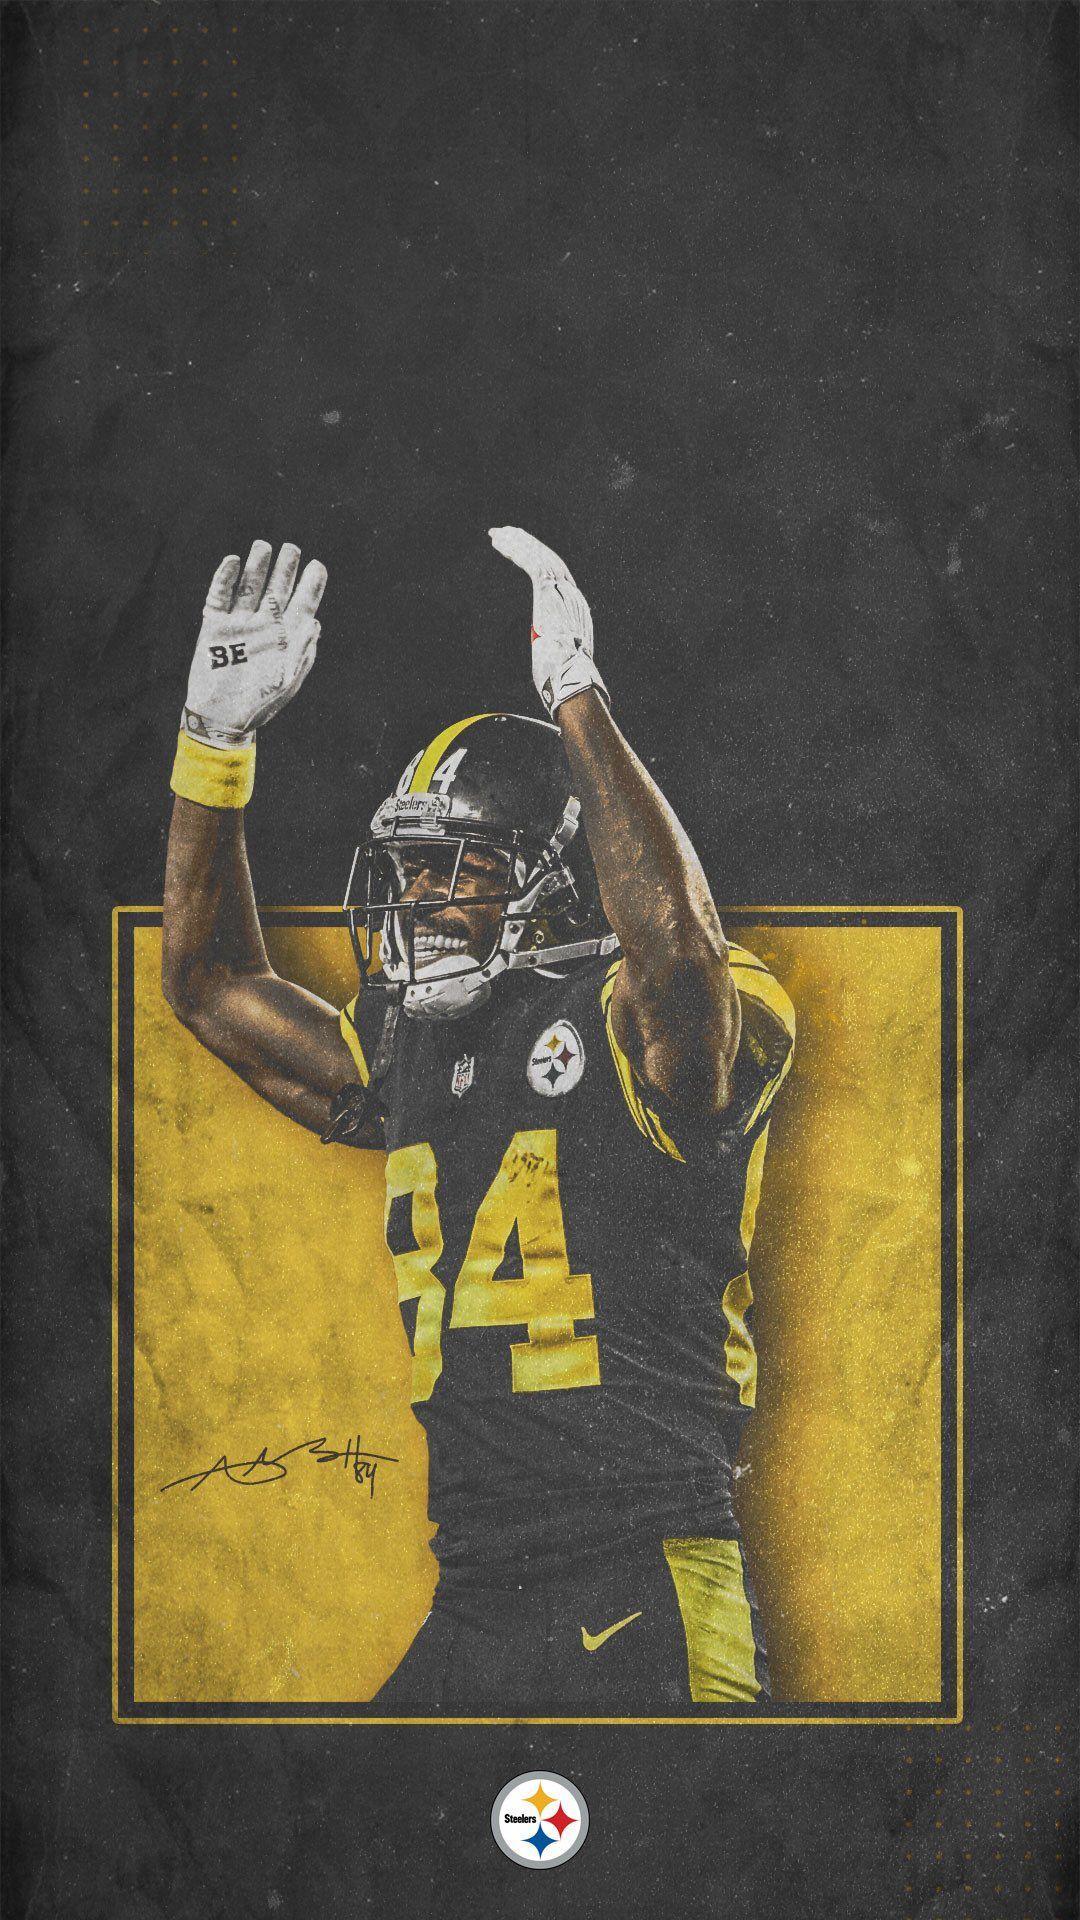 Juju Steelers Iphone Background【2020】 デザイン, アイデア, スポーツ